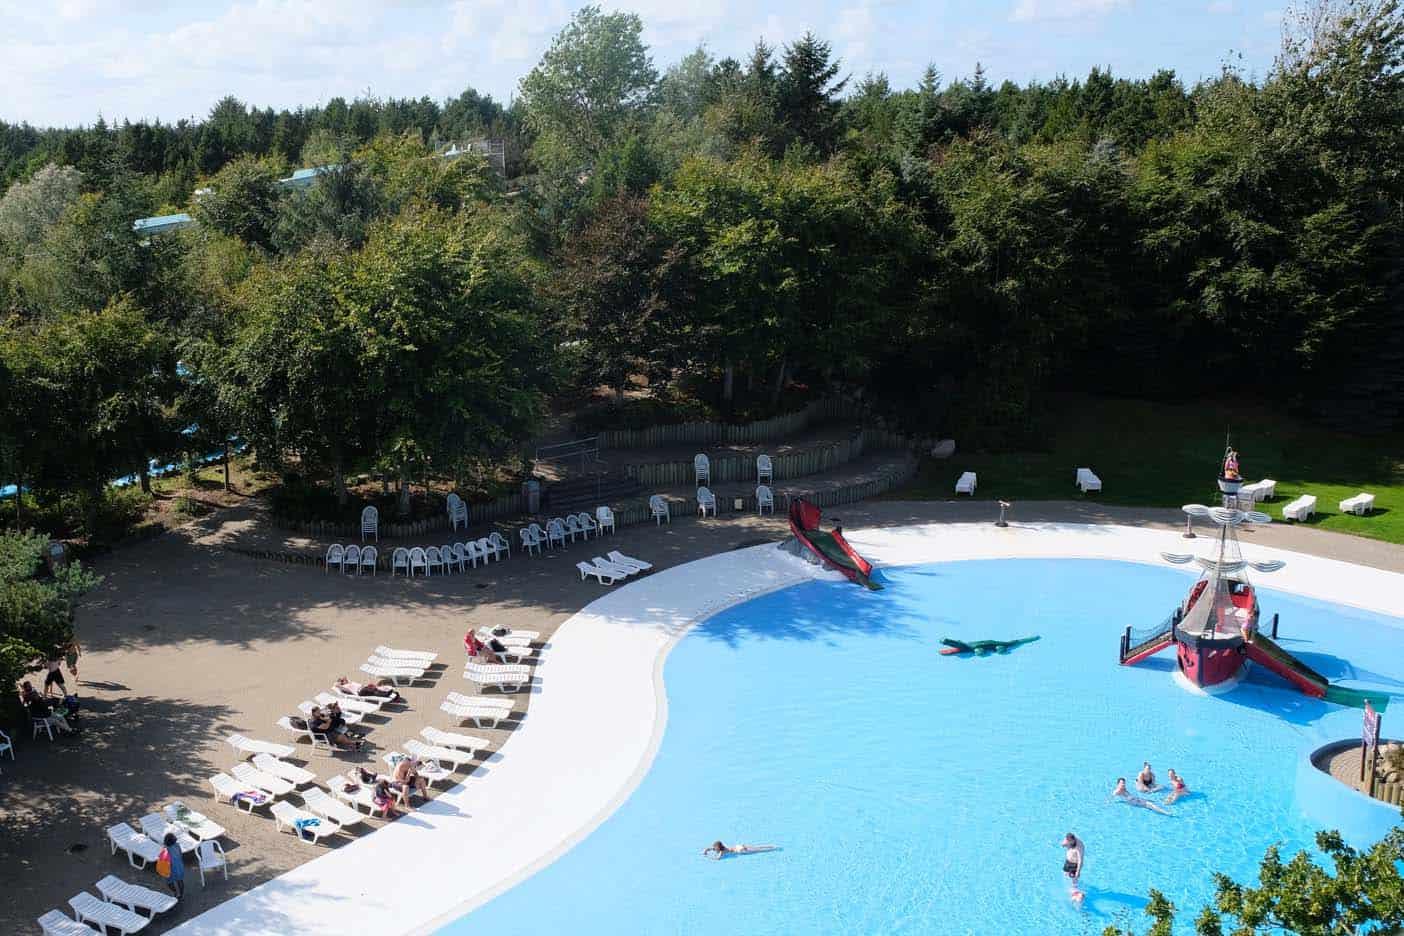 Farup sommerland waterpark denemarken